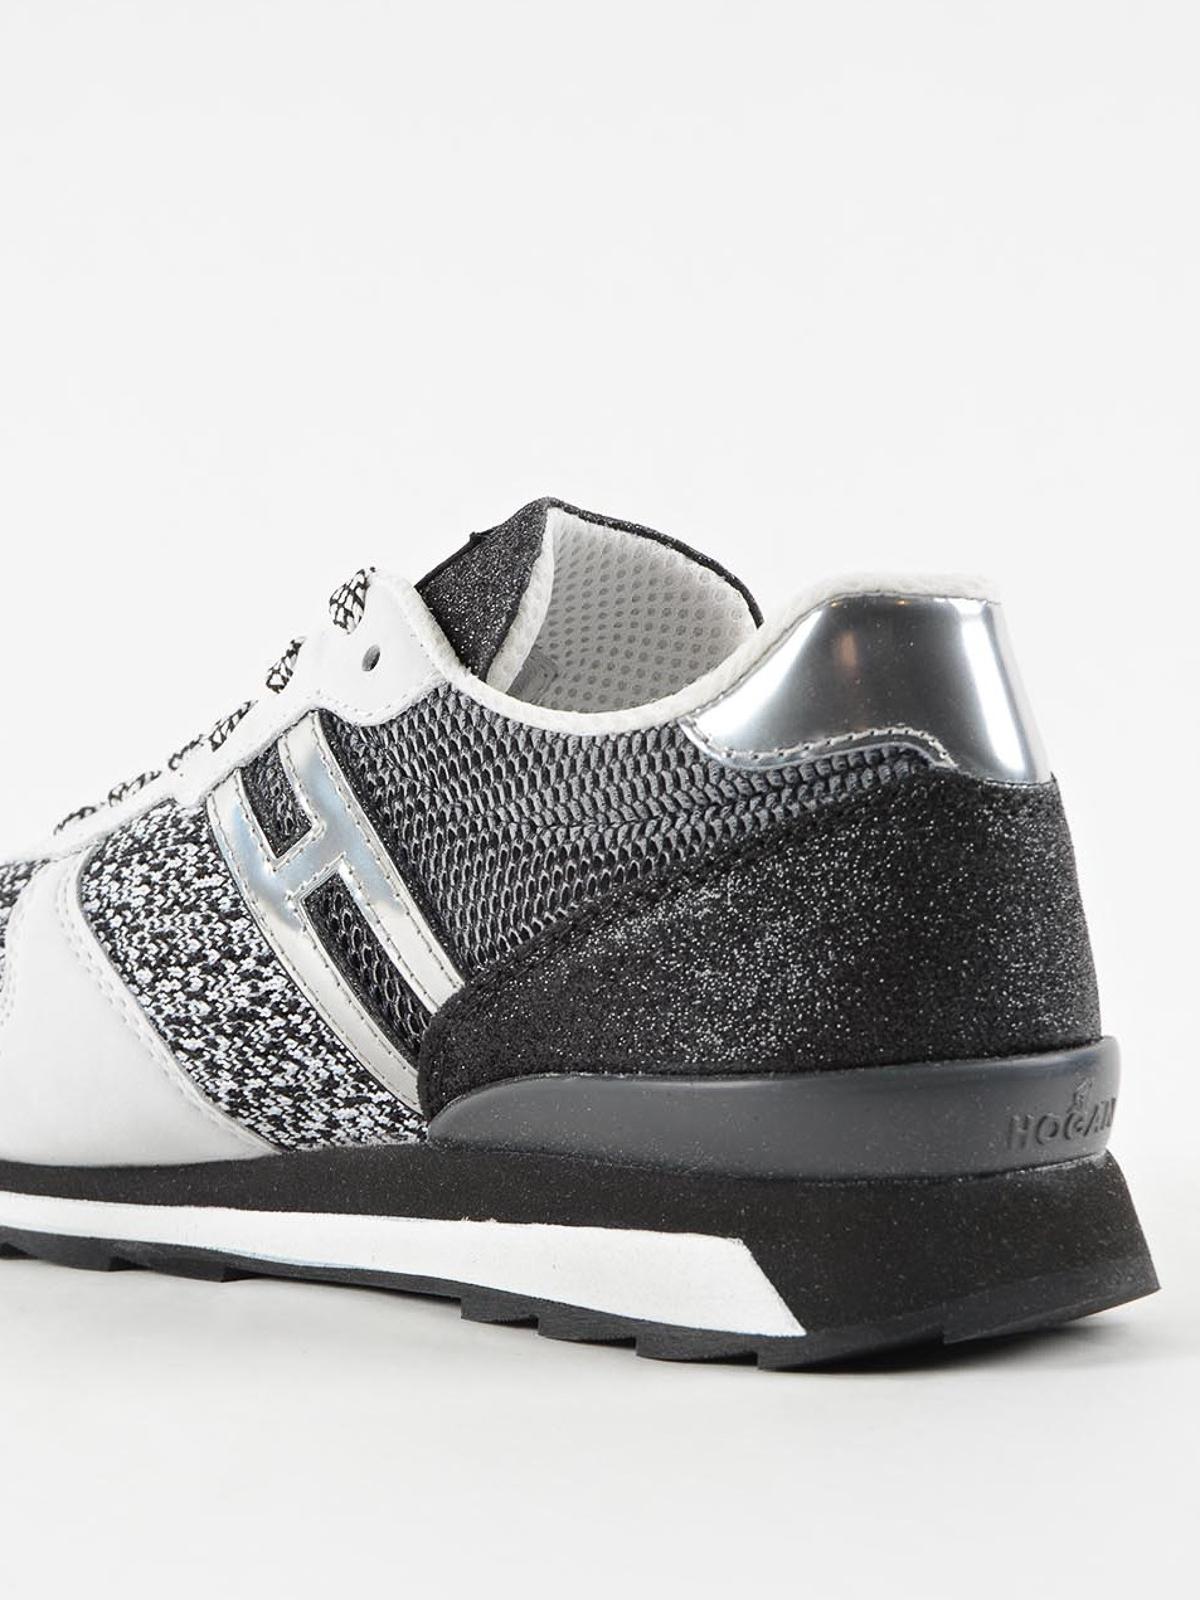 Conception innovante ce3b4 dcdc3 Hogan Rebel - Baskets Running-R261 Pour Femme - Chaussures ...